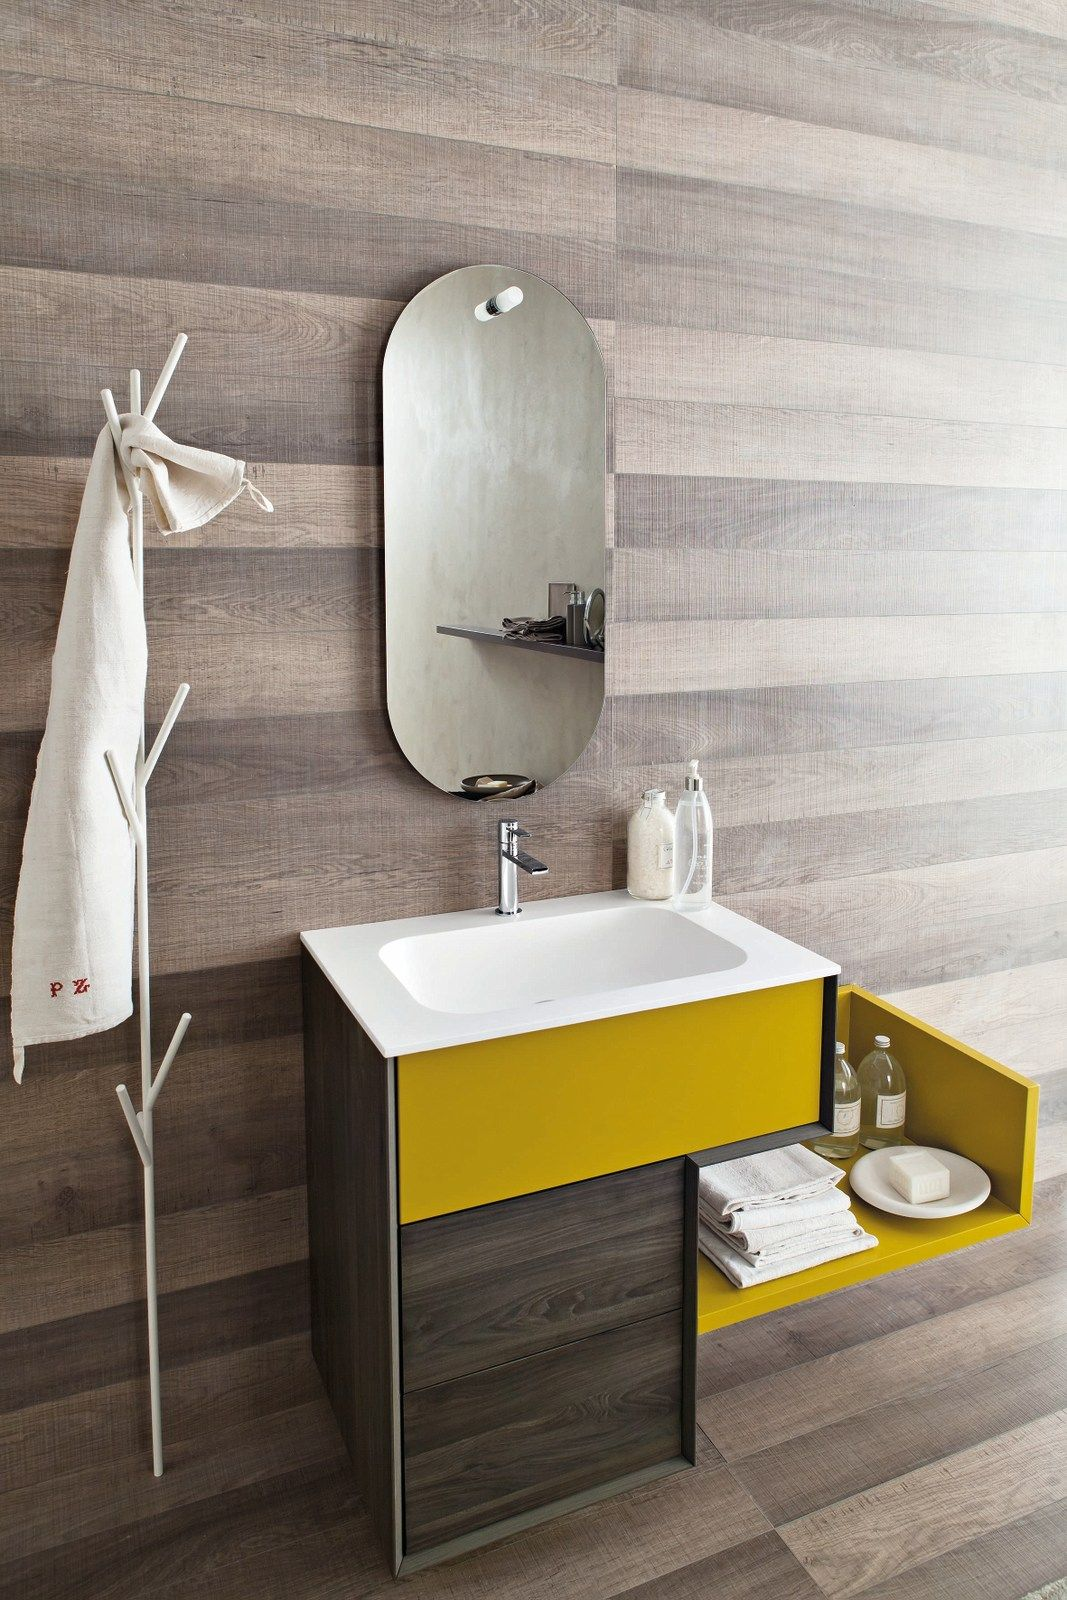 Designer Vanity Units For Bathroom Unique Single Hpl Vanity Unit With Mirror Libera 3D  Composition L09 2018